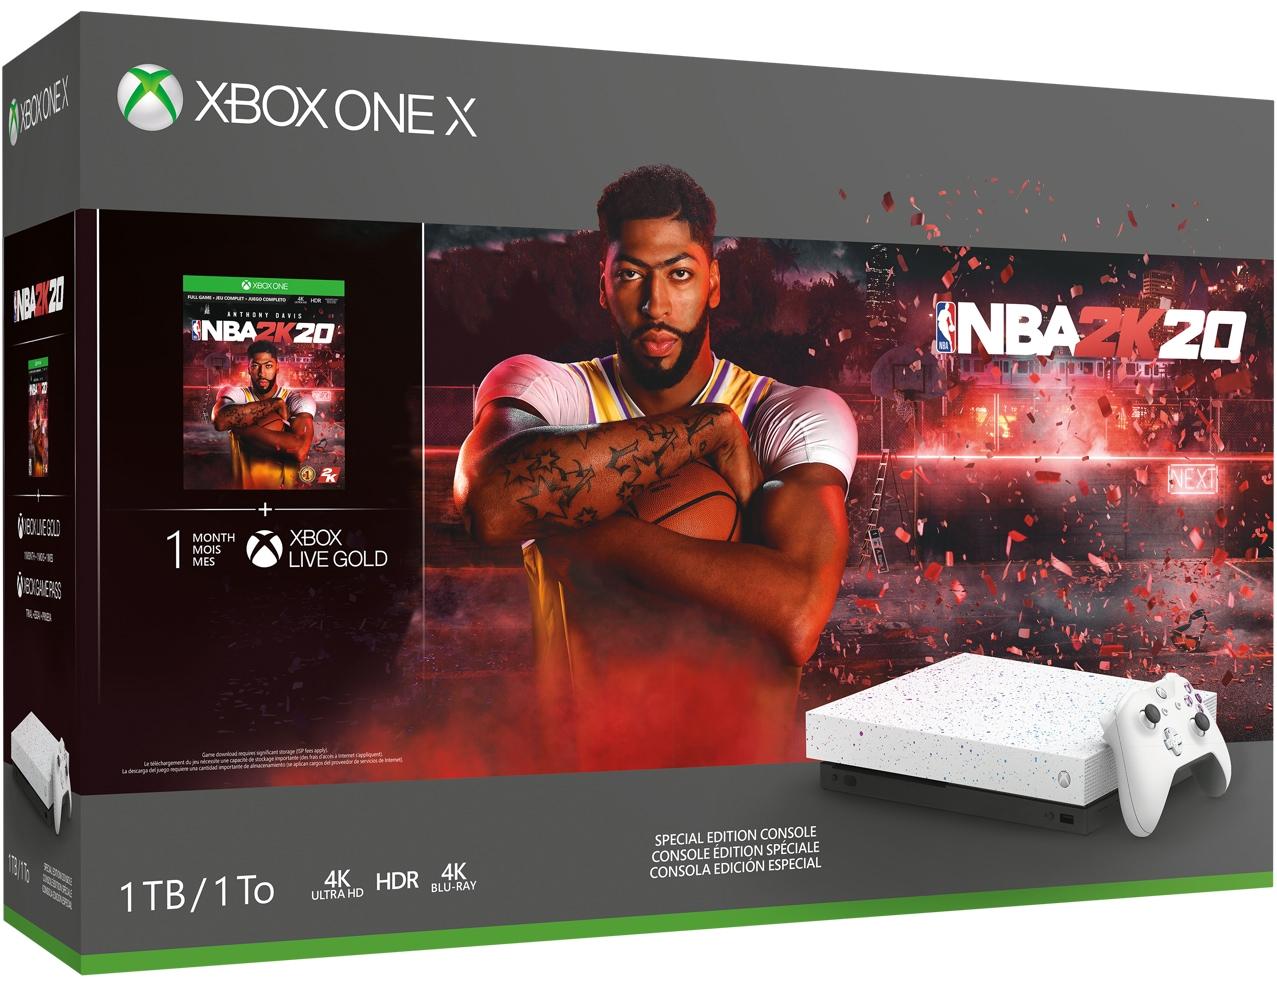 Xbox One X NBA 2K20 Special Edition Bundle box art